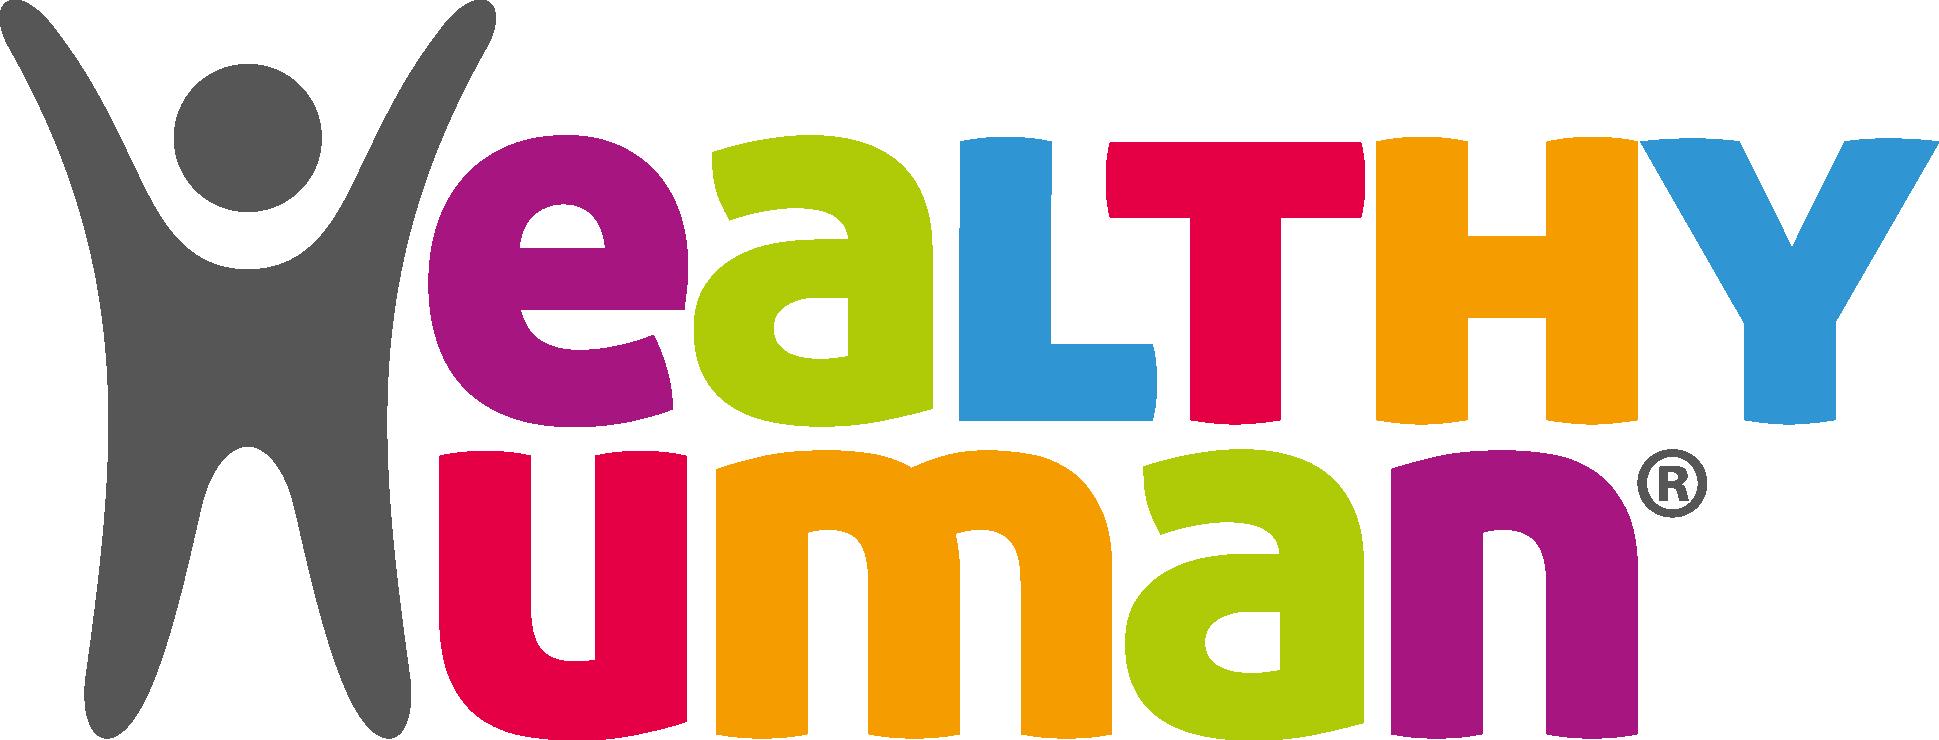 Episode Sponsor Logo: Essentia Mattress